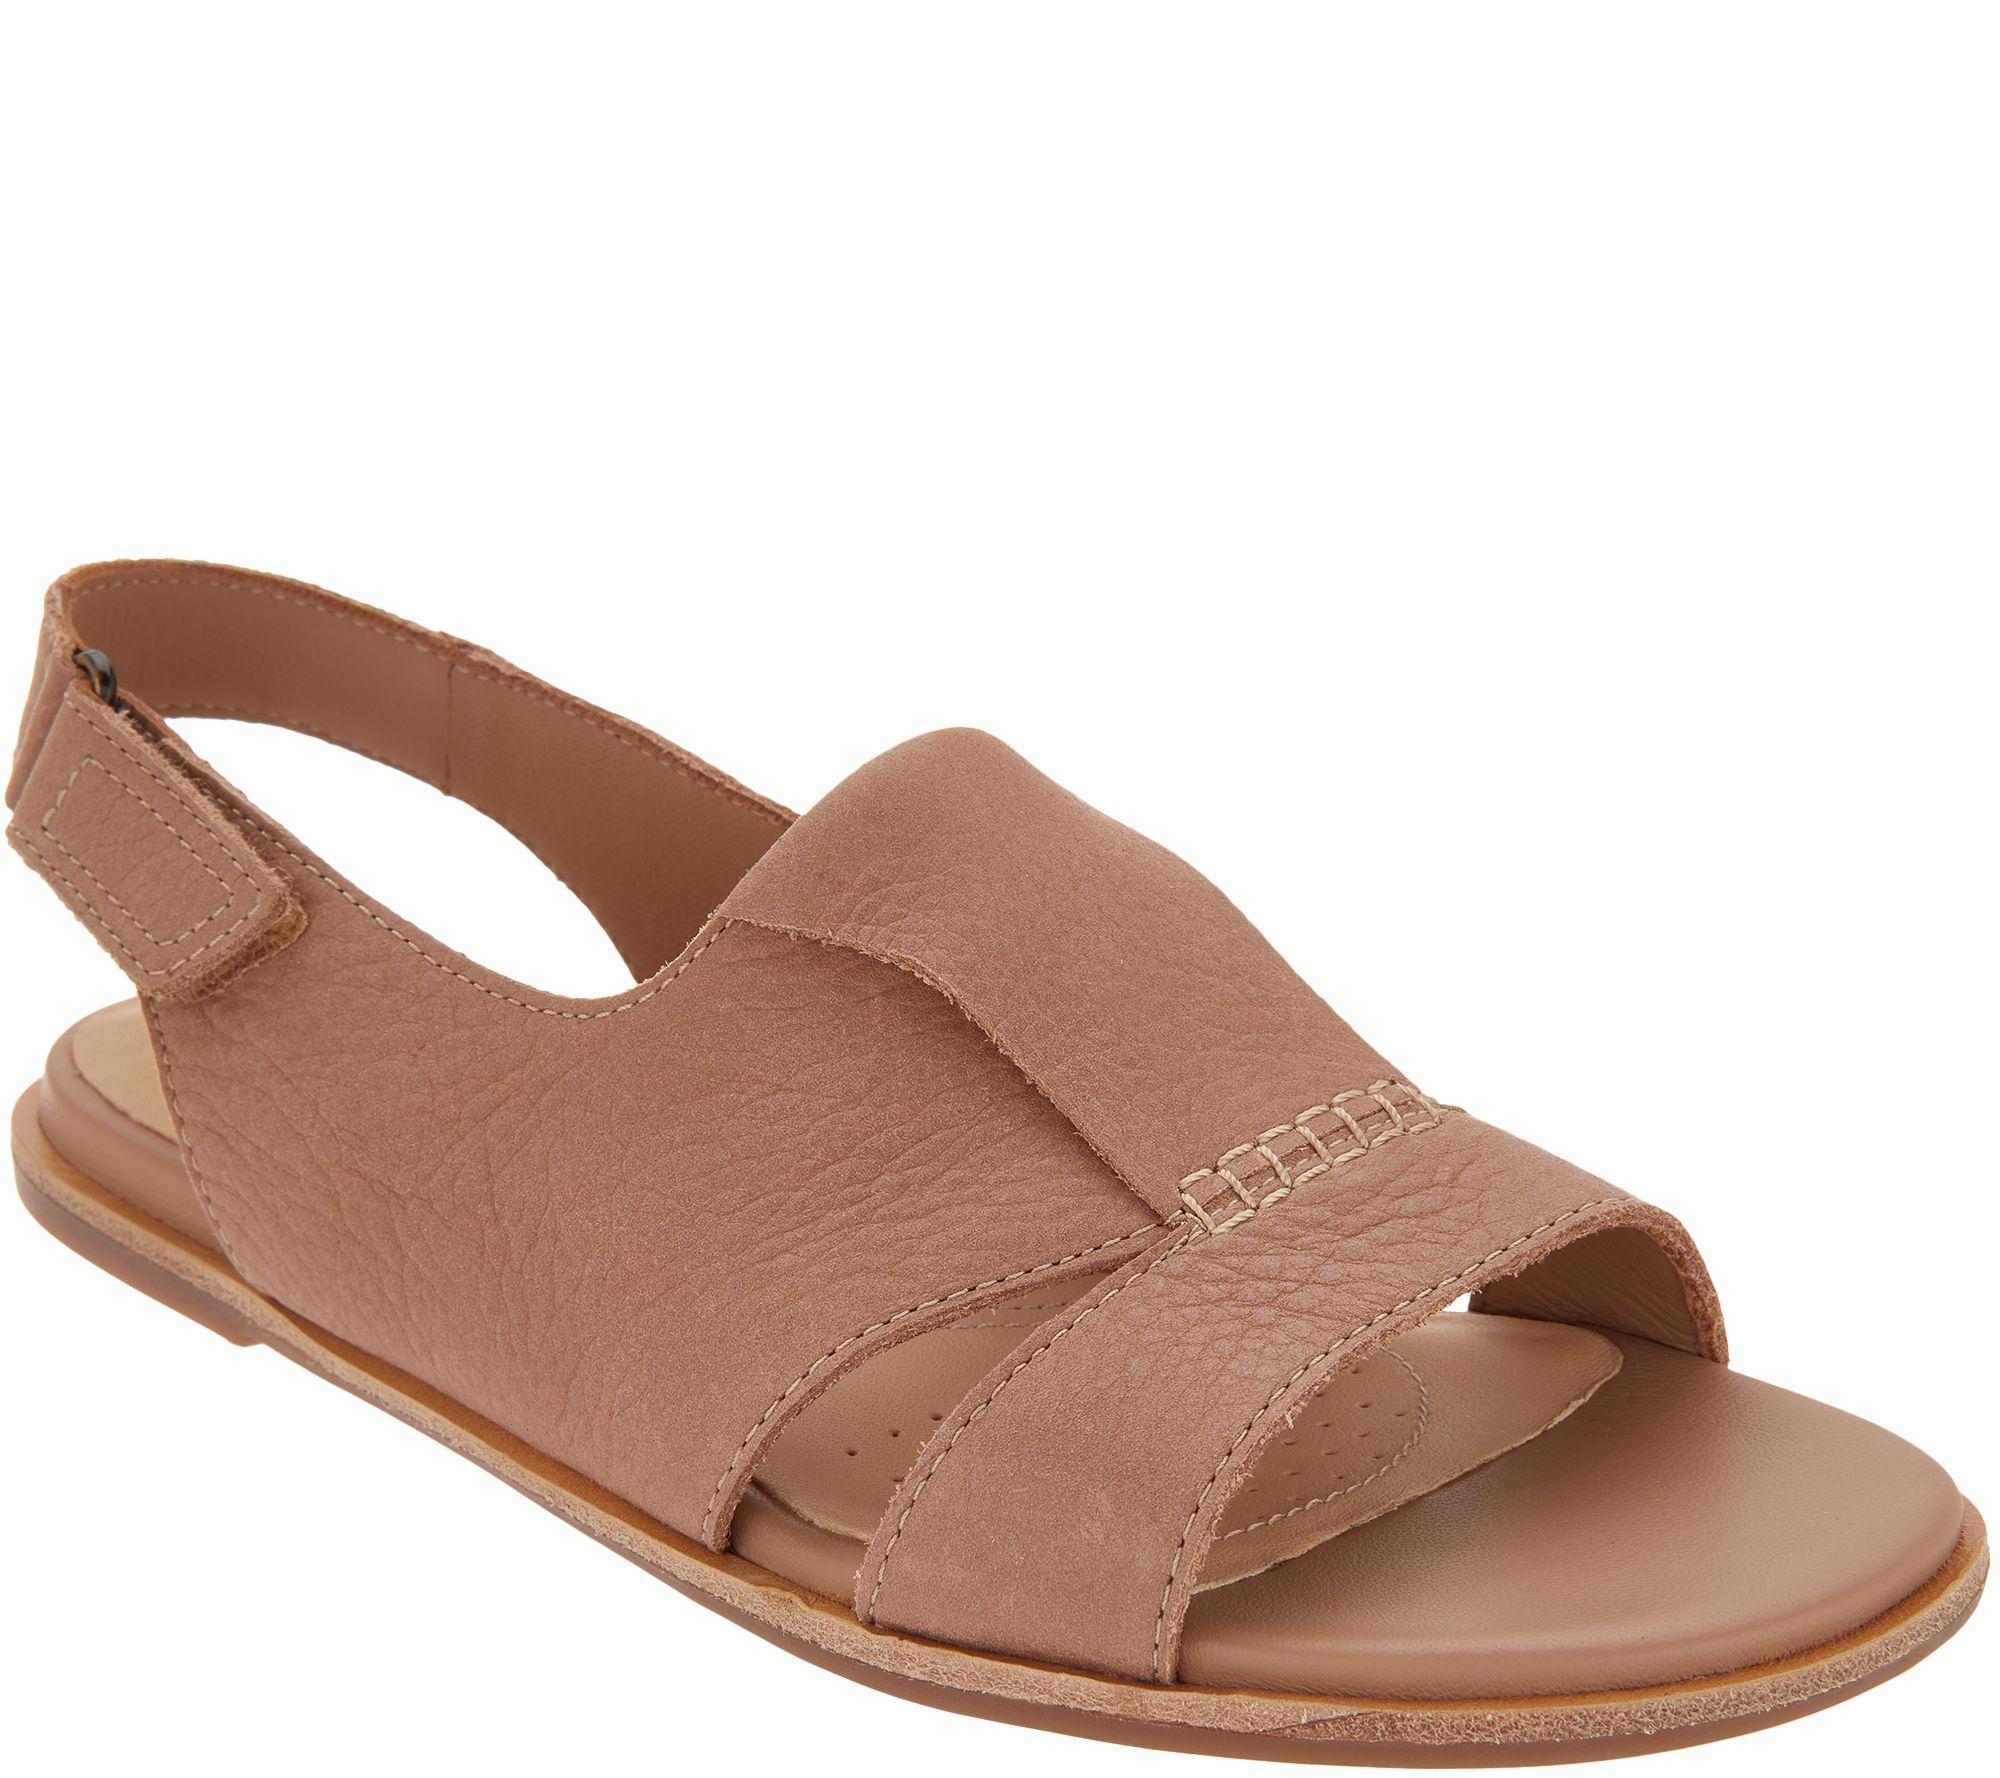 1536013d7e98 Clarks Artisan Leather Sandals - Sultana Rayne - Page 1 — QVC.com